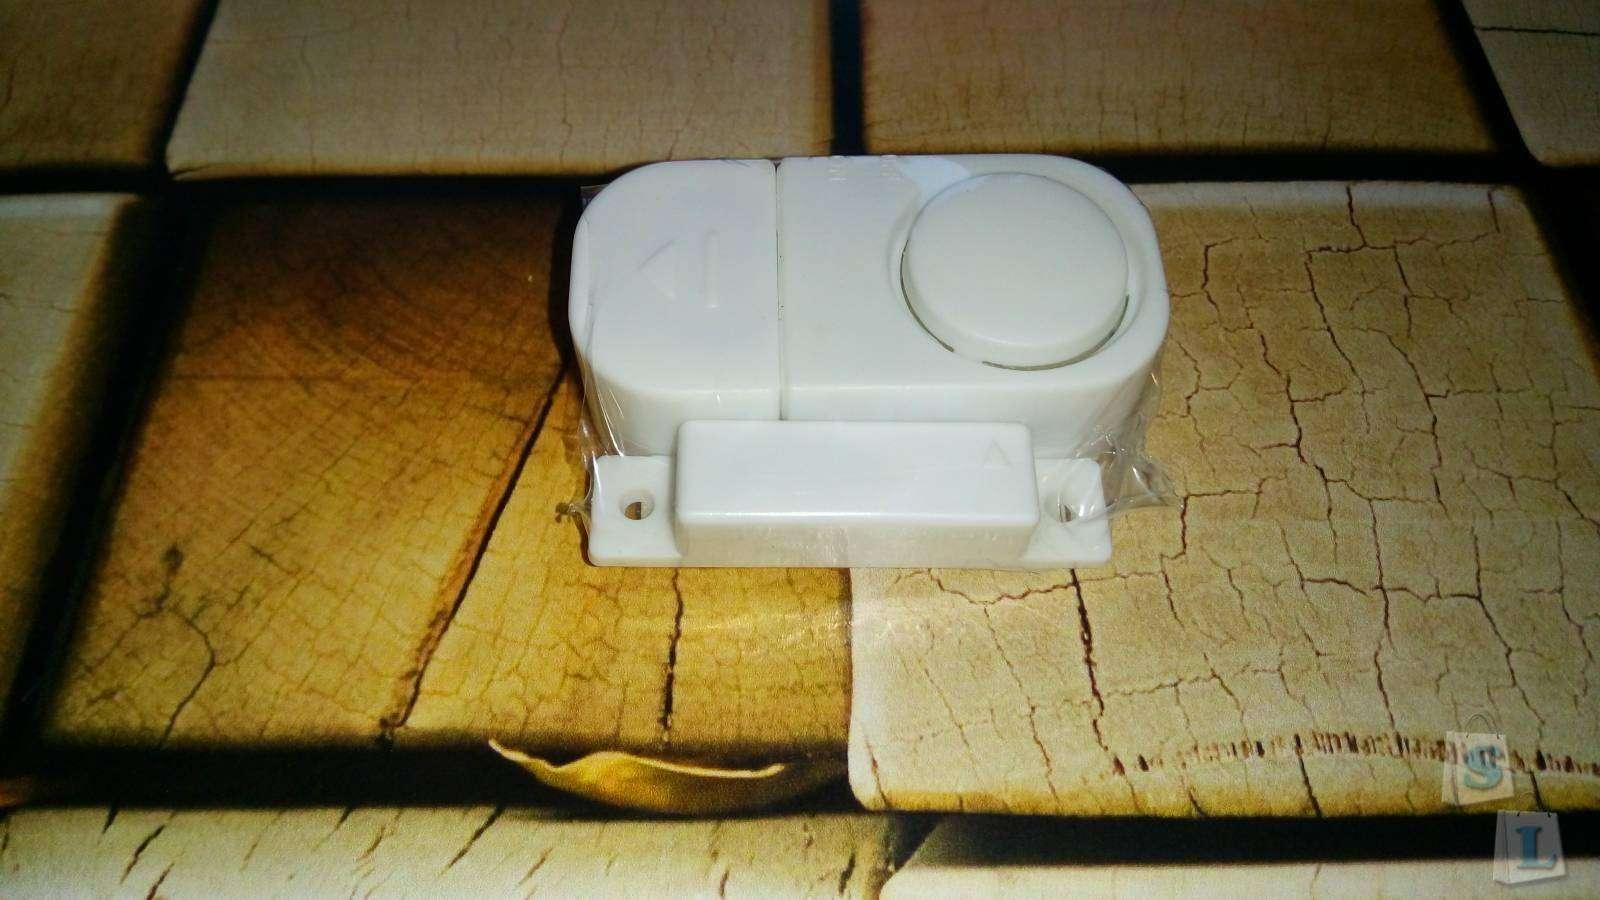 Aliexpress: Термоусадочные пакеты - 100 штук 8 х 18 см